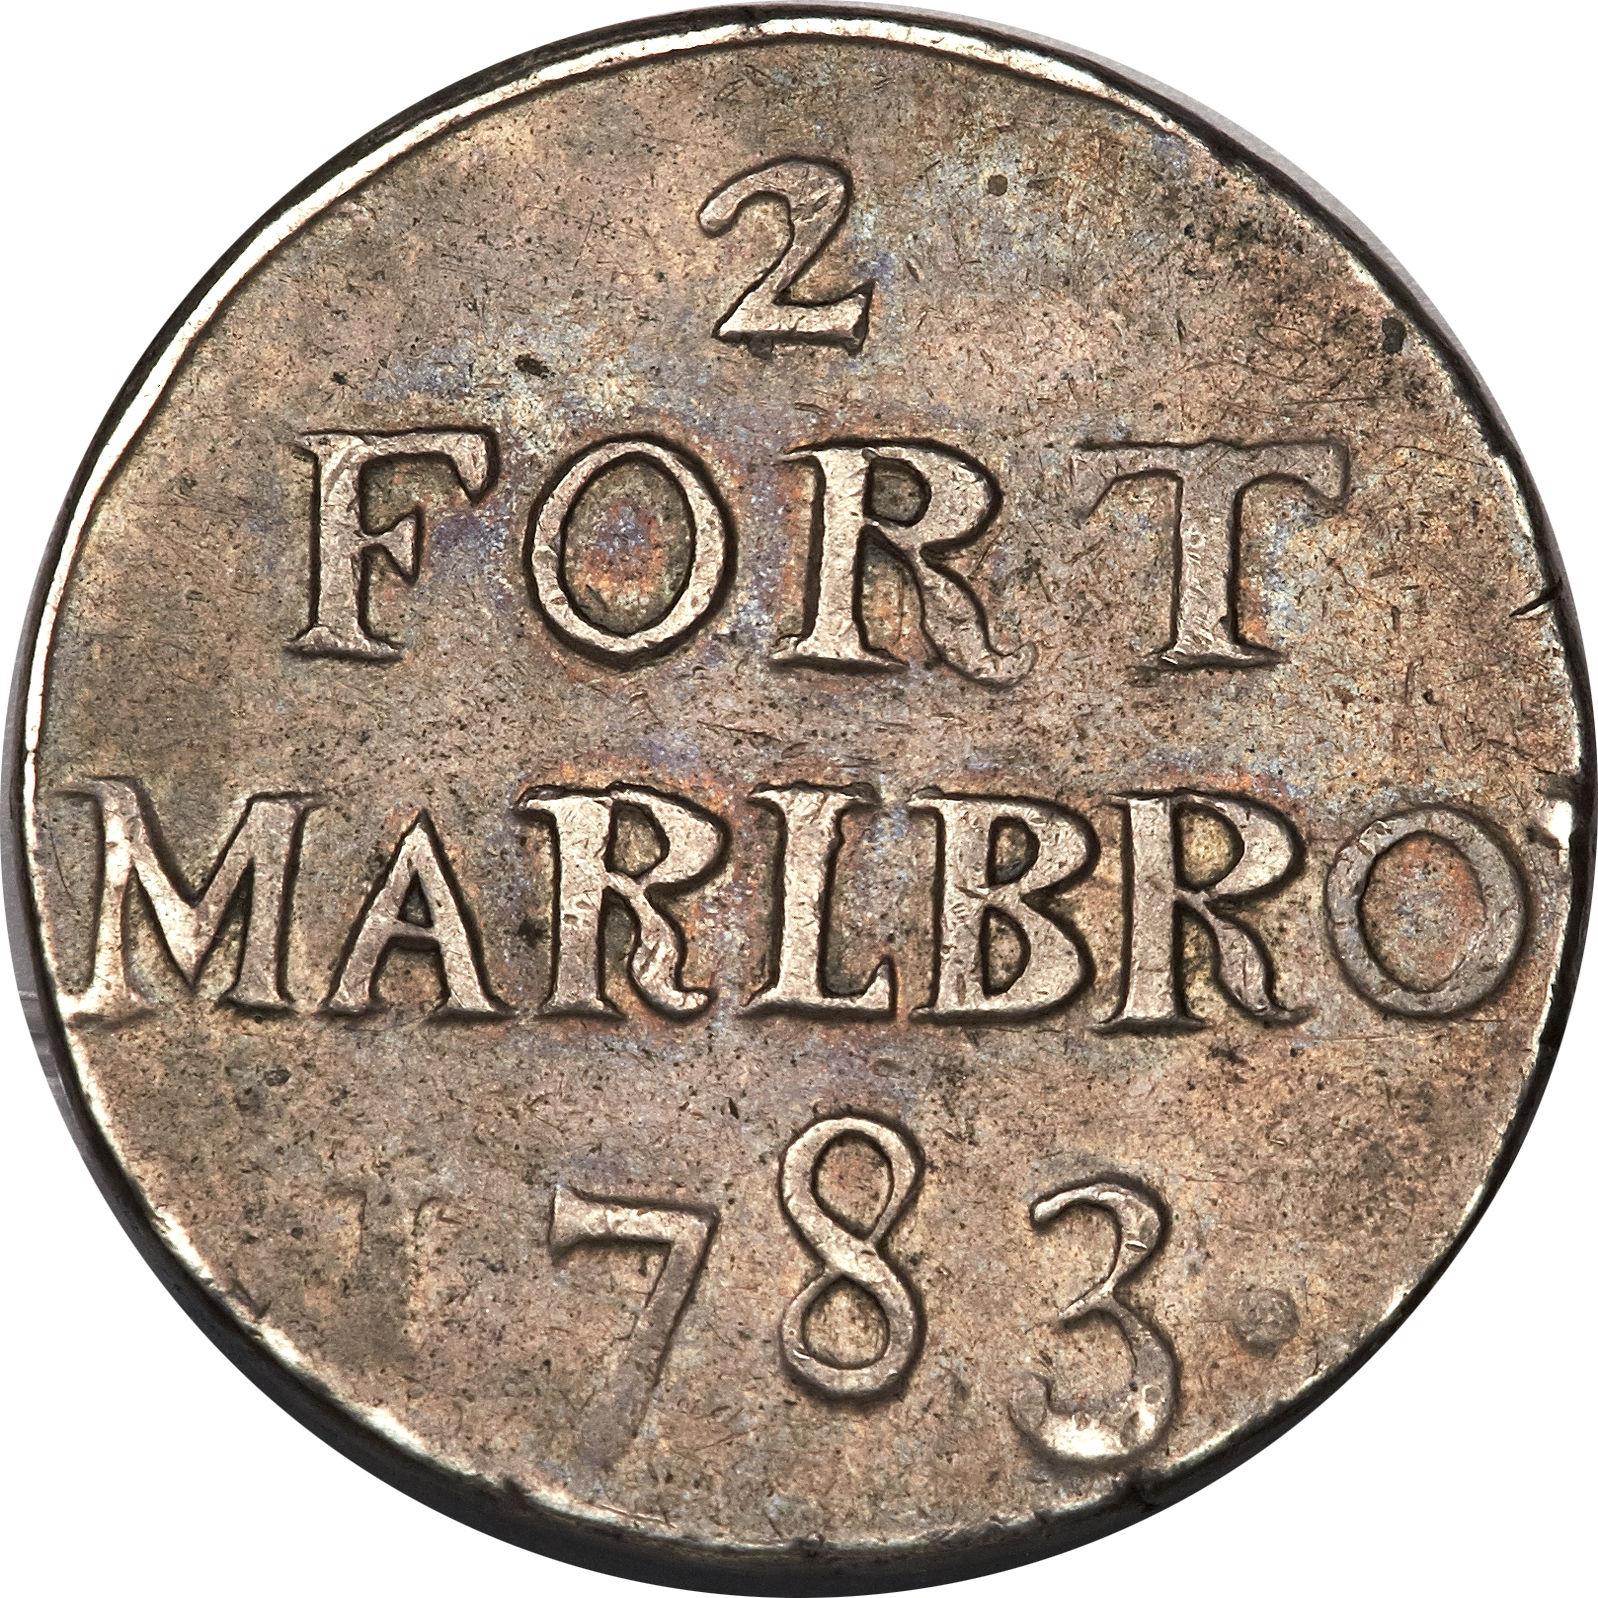 Km271 1 злотый 1994 года цена